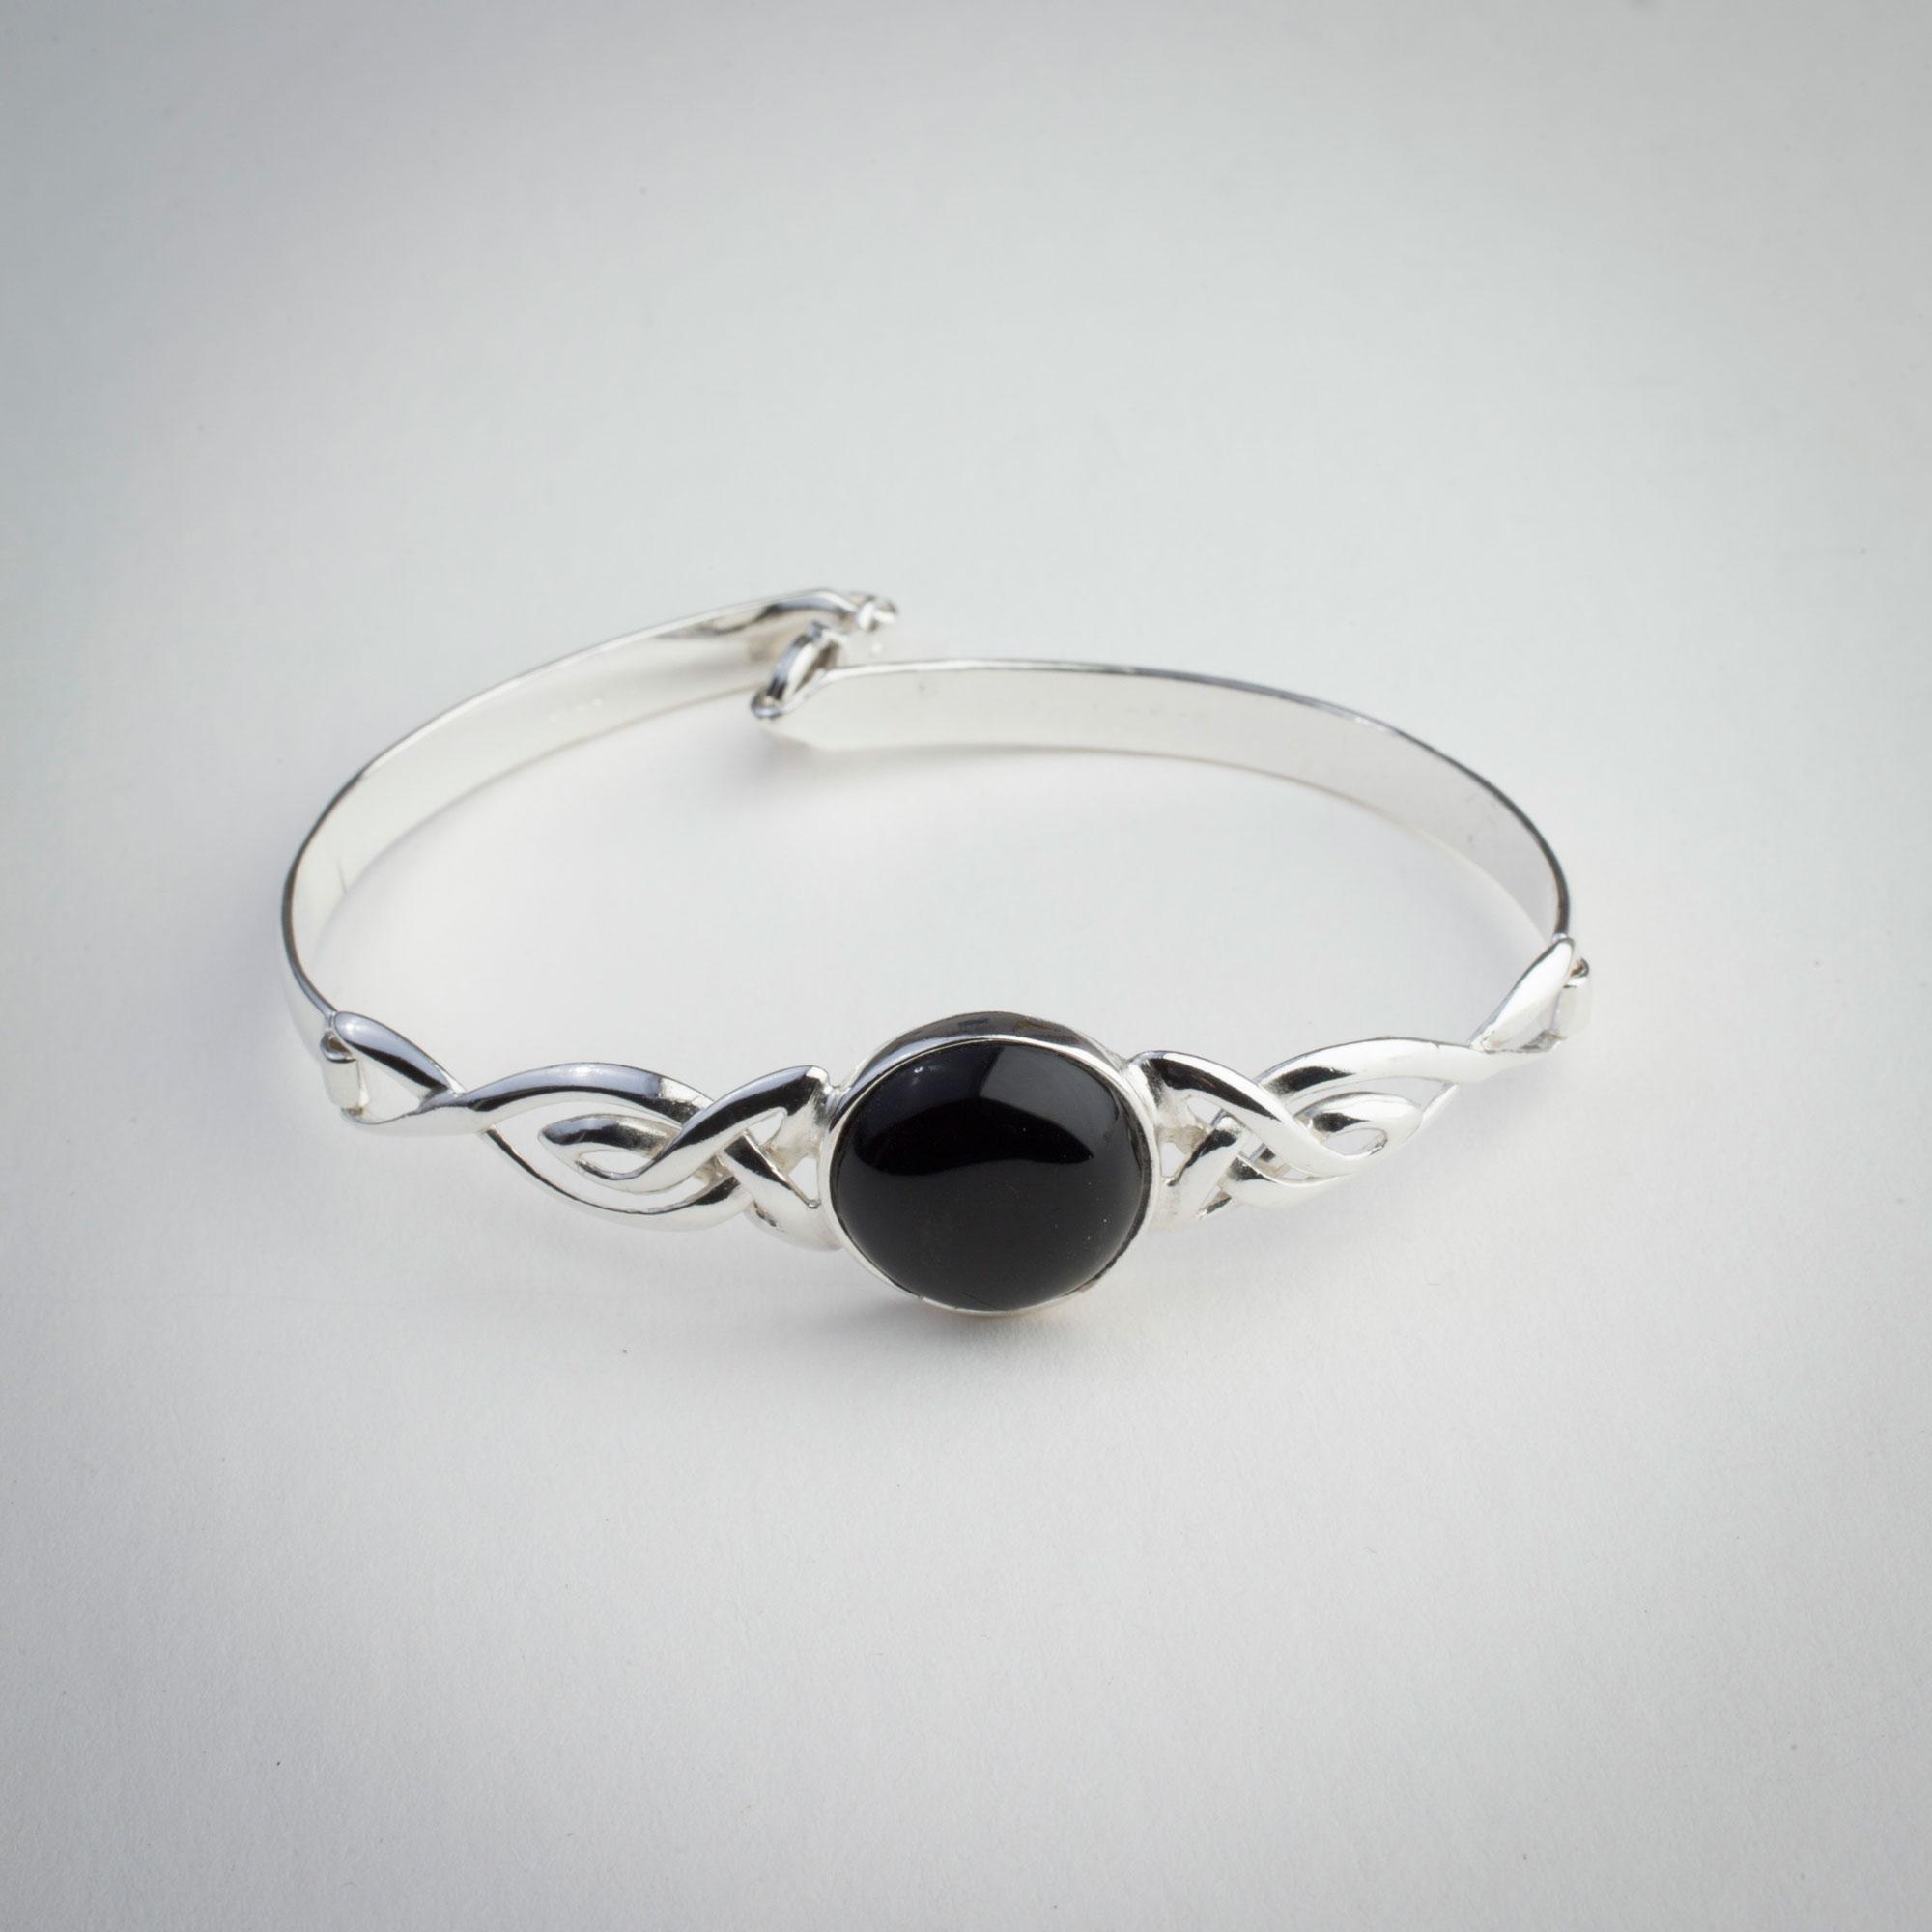 whitby-jet-jewellery5.jpg